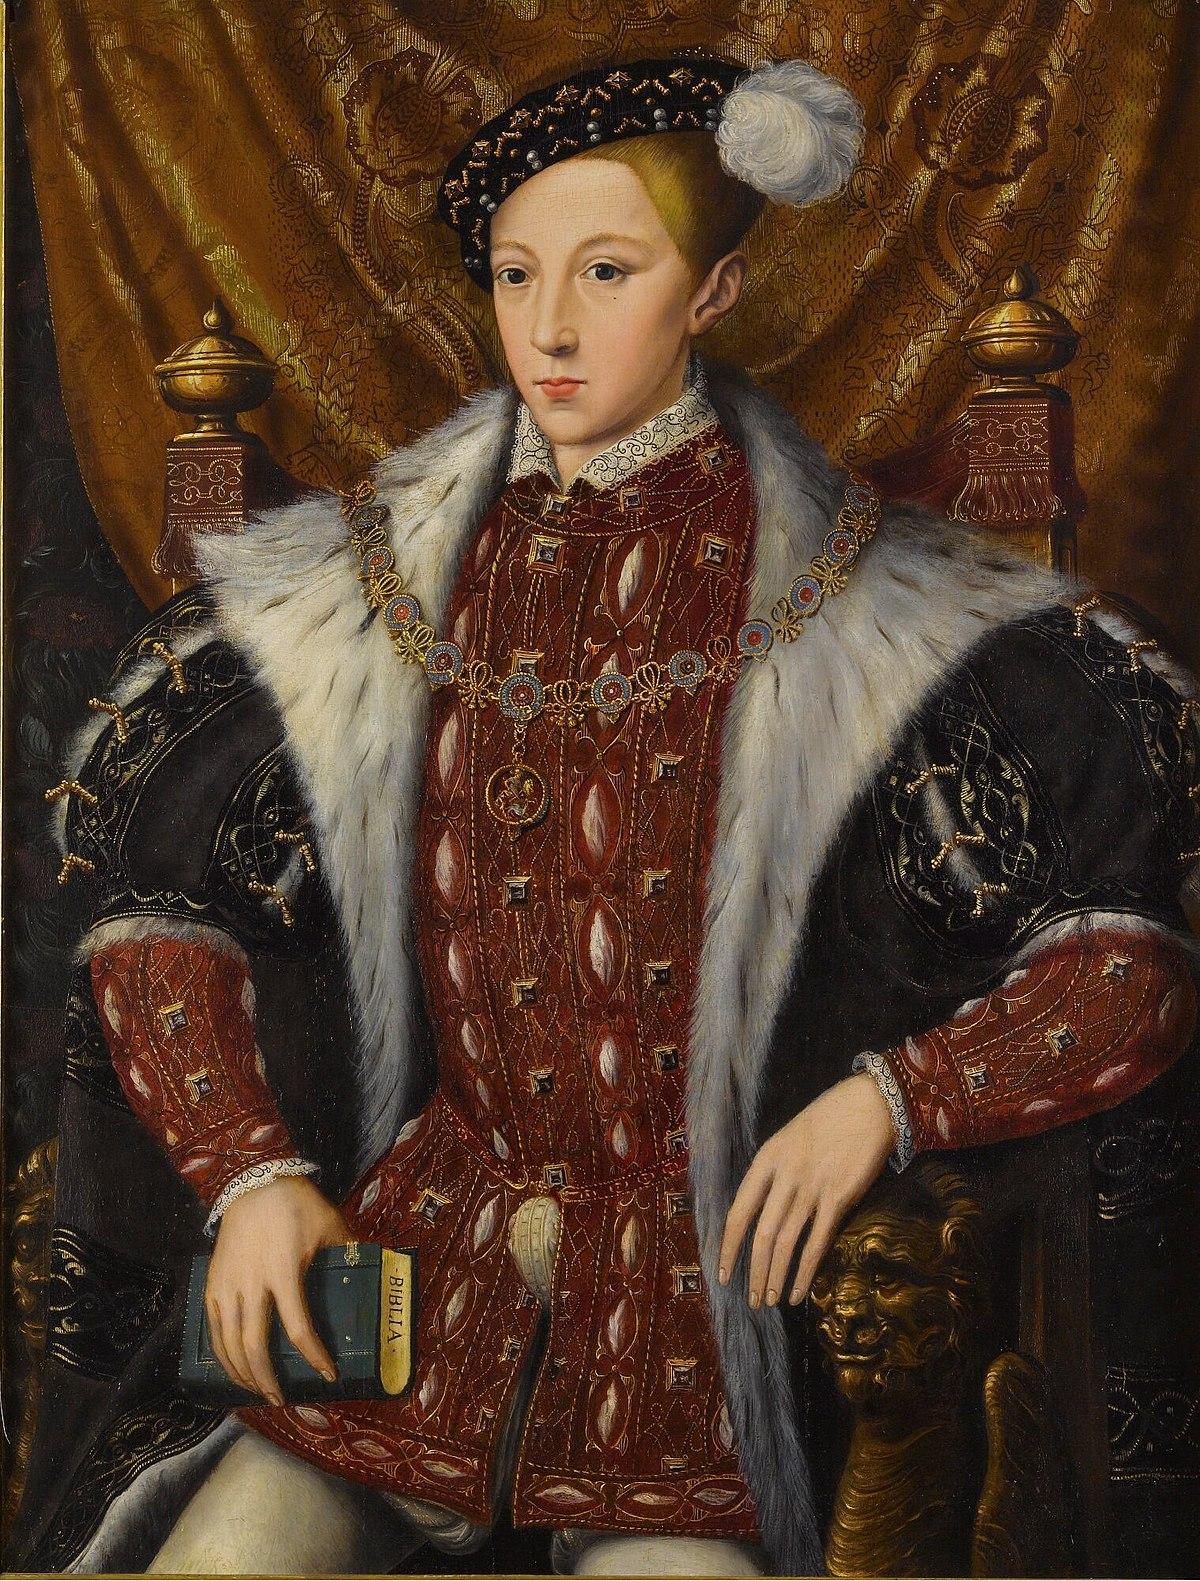 Edward VI of England - Wikipedia